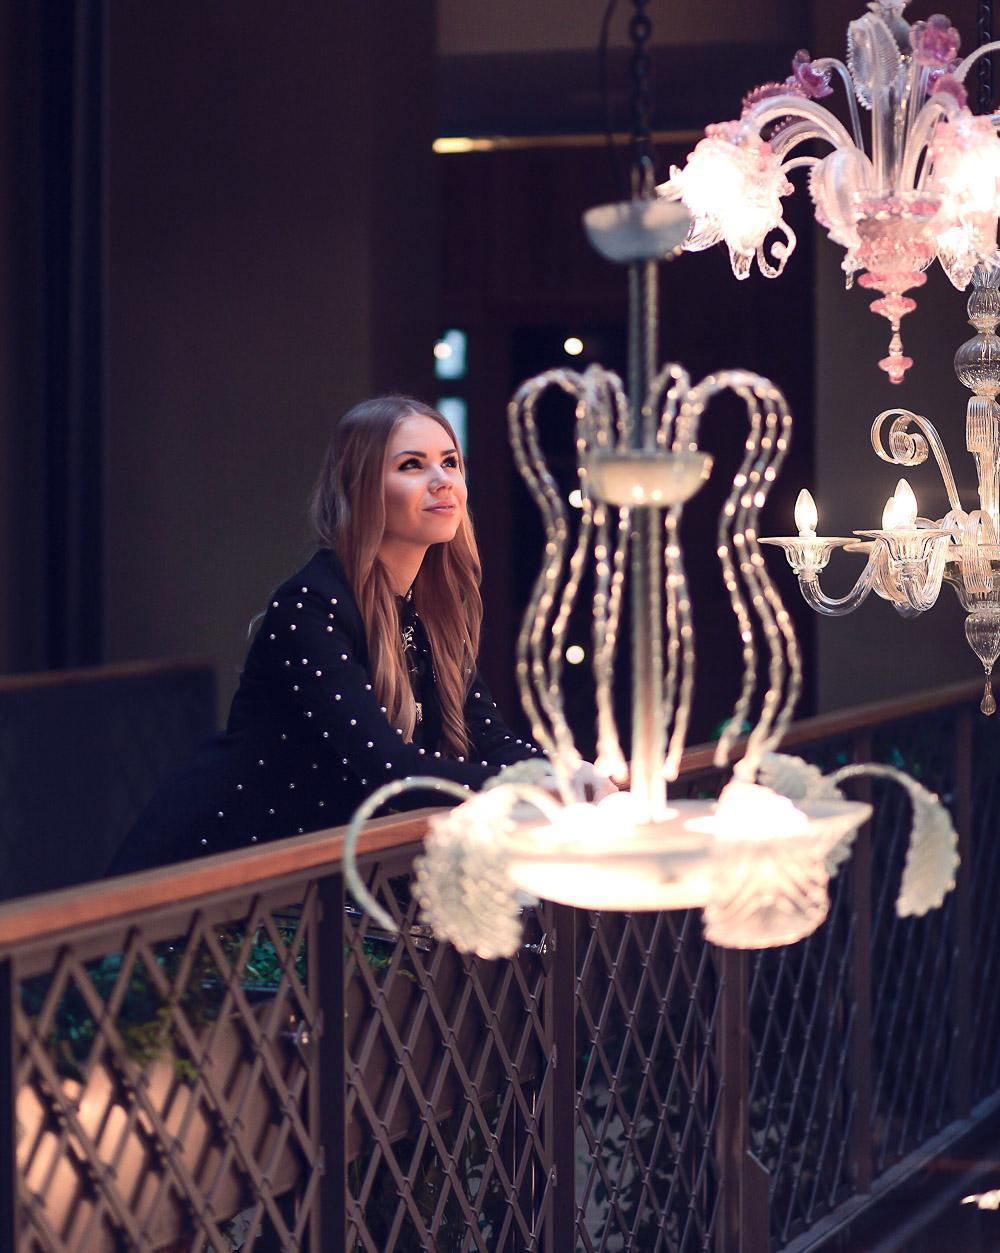 25 Hours Hotel Instagram Foto therubinrose-Lampen